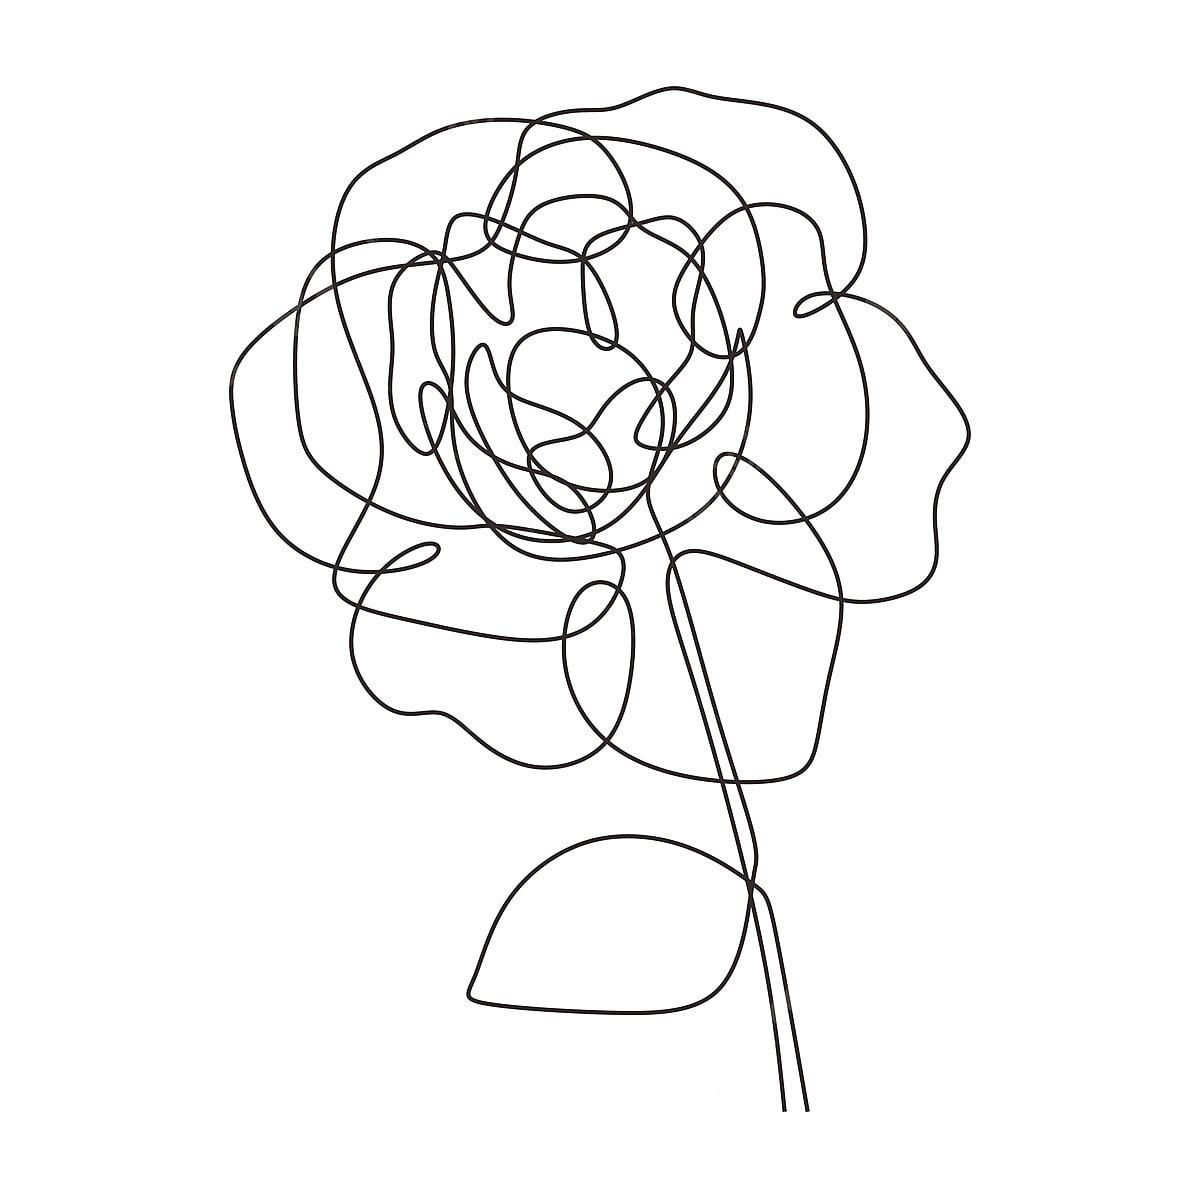 Fleur Rose One Line Vector Dessin Minimaliste Style Simplicite